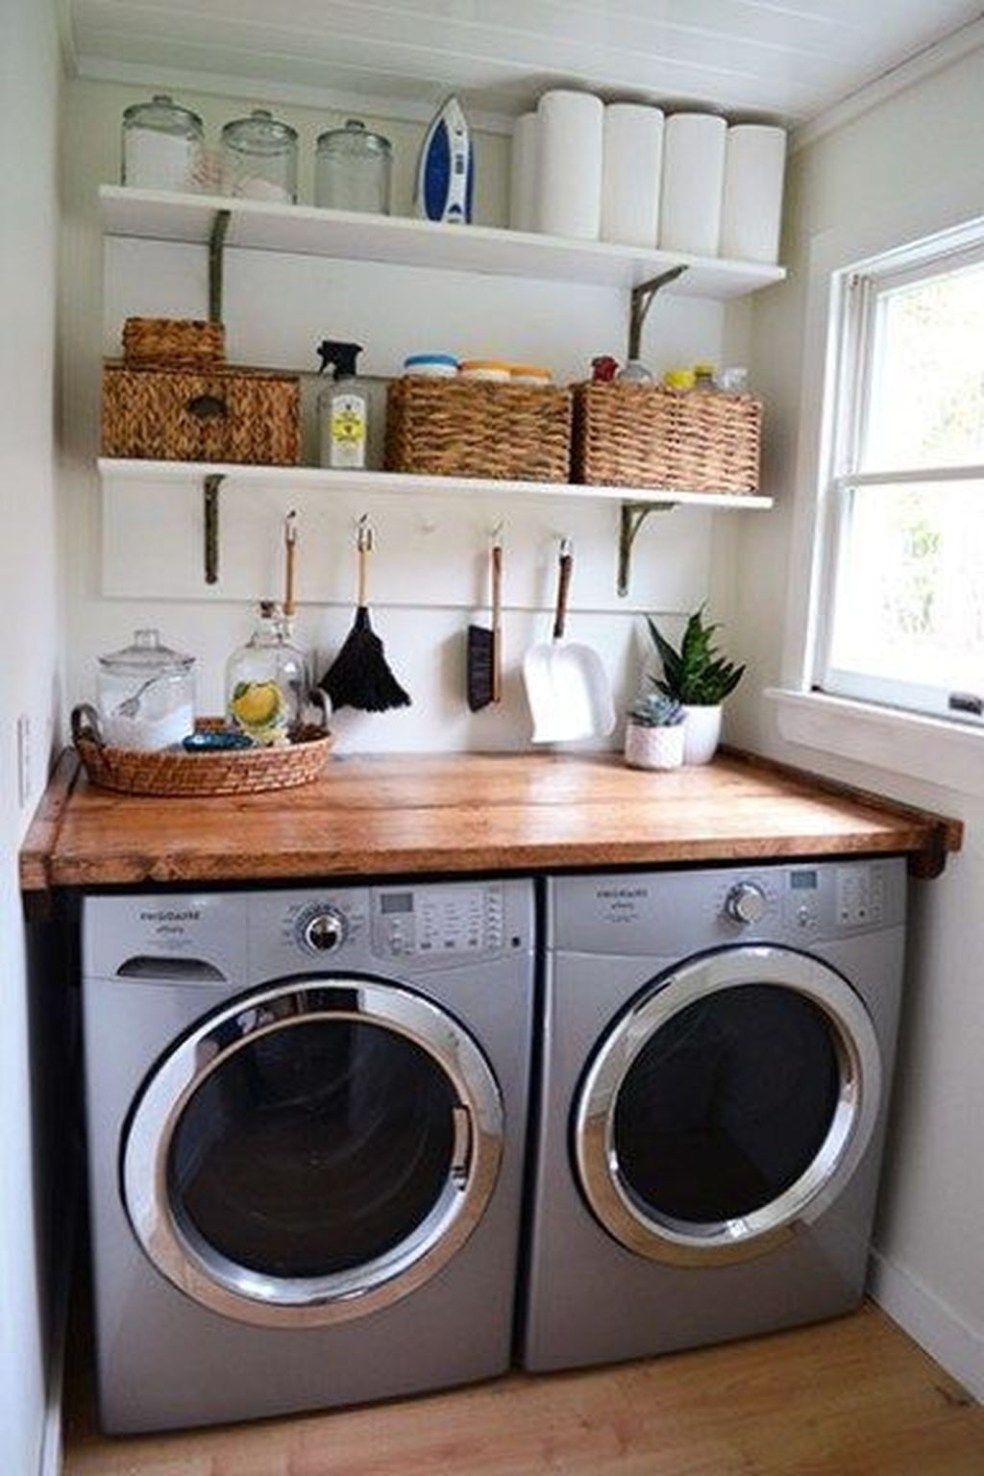 42 Beautiful Scandinavian Laundry Room Design Ideas images